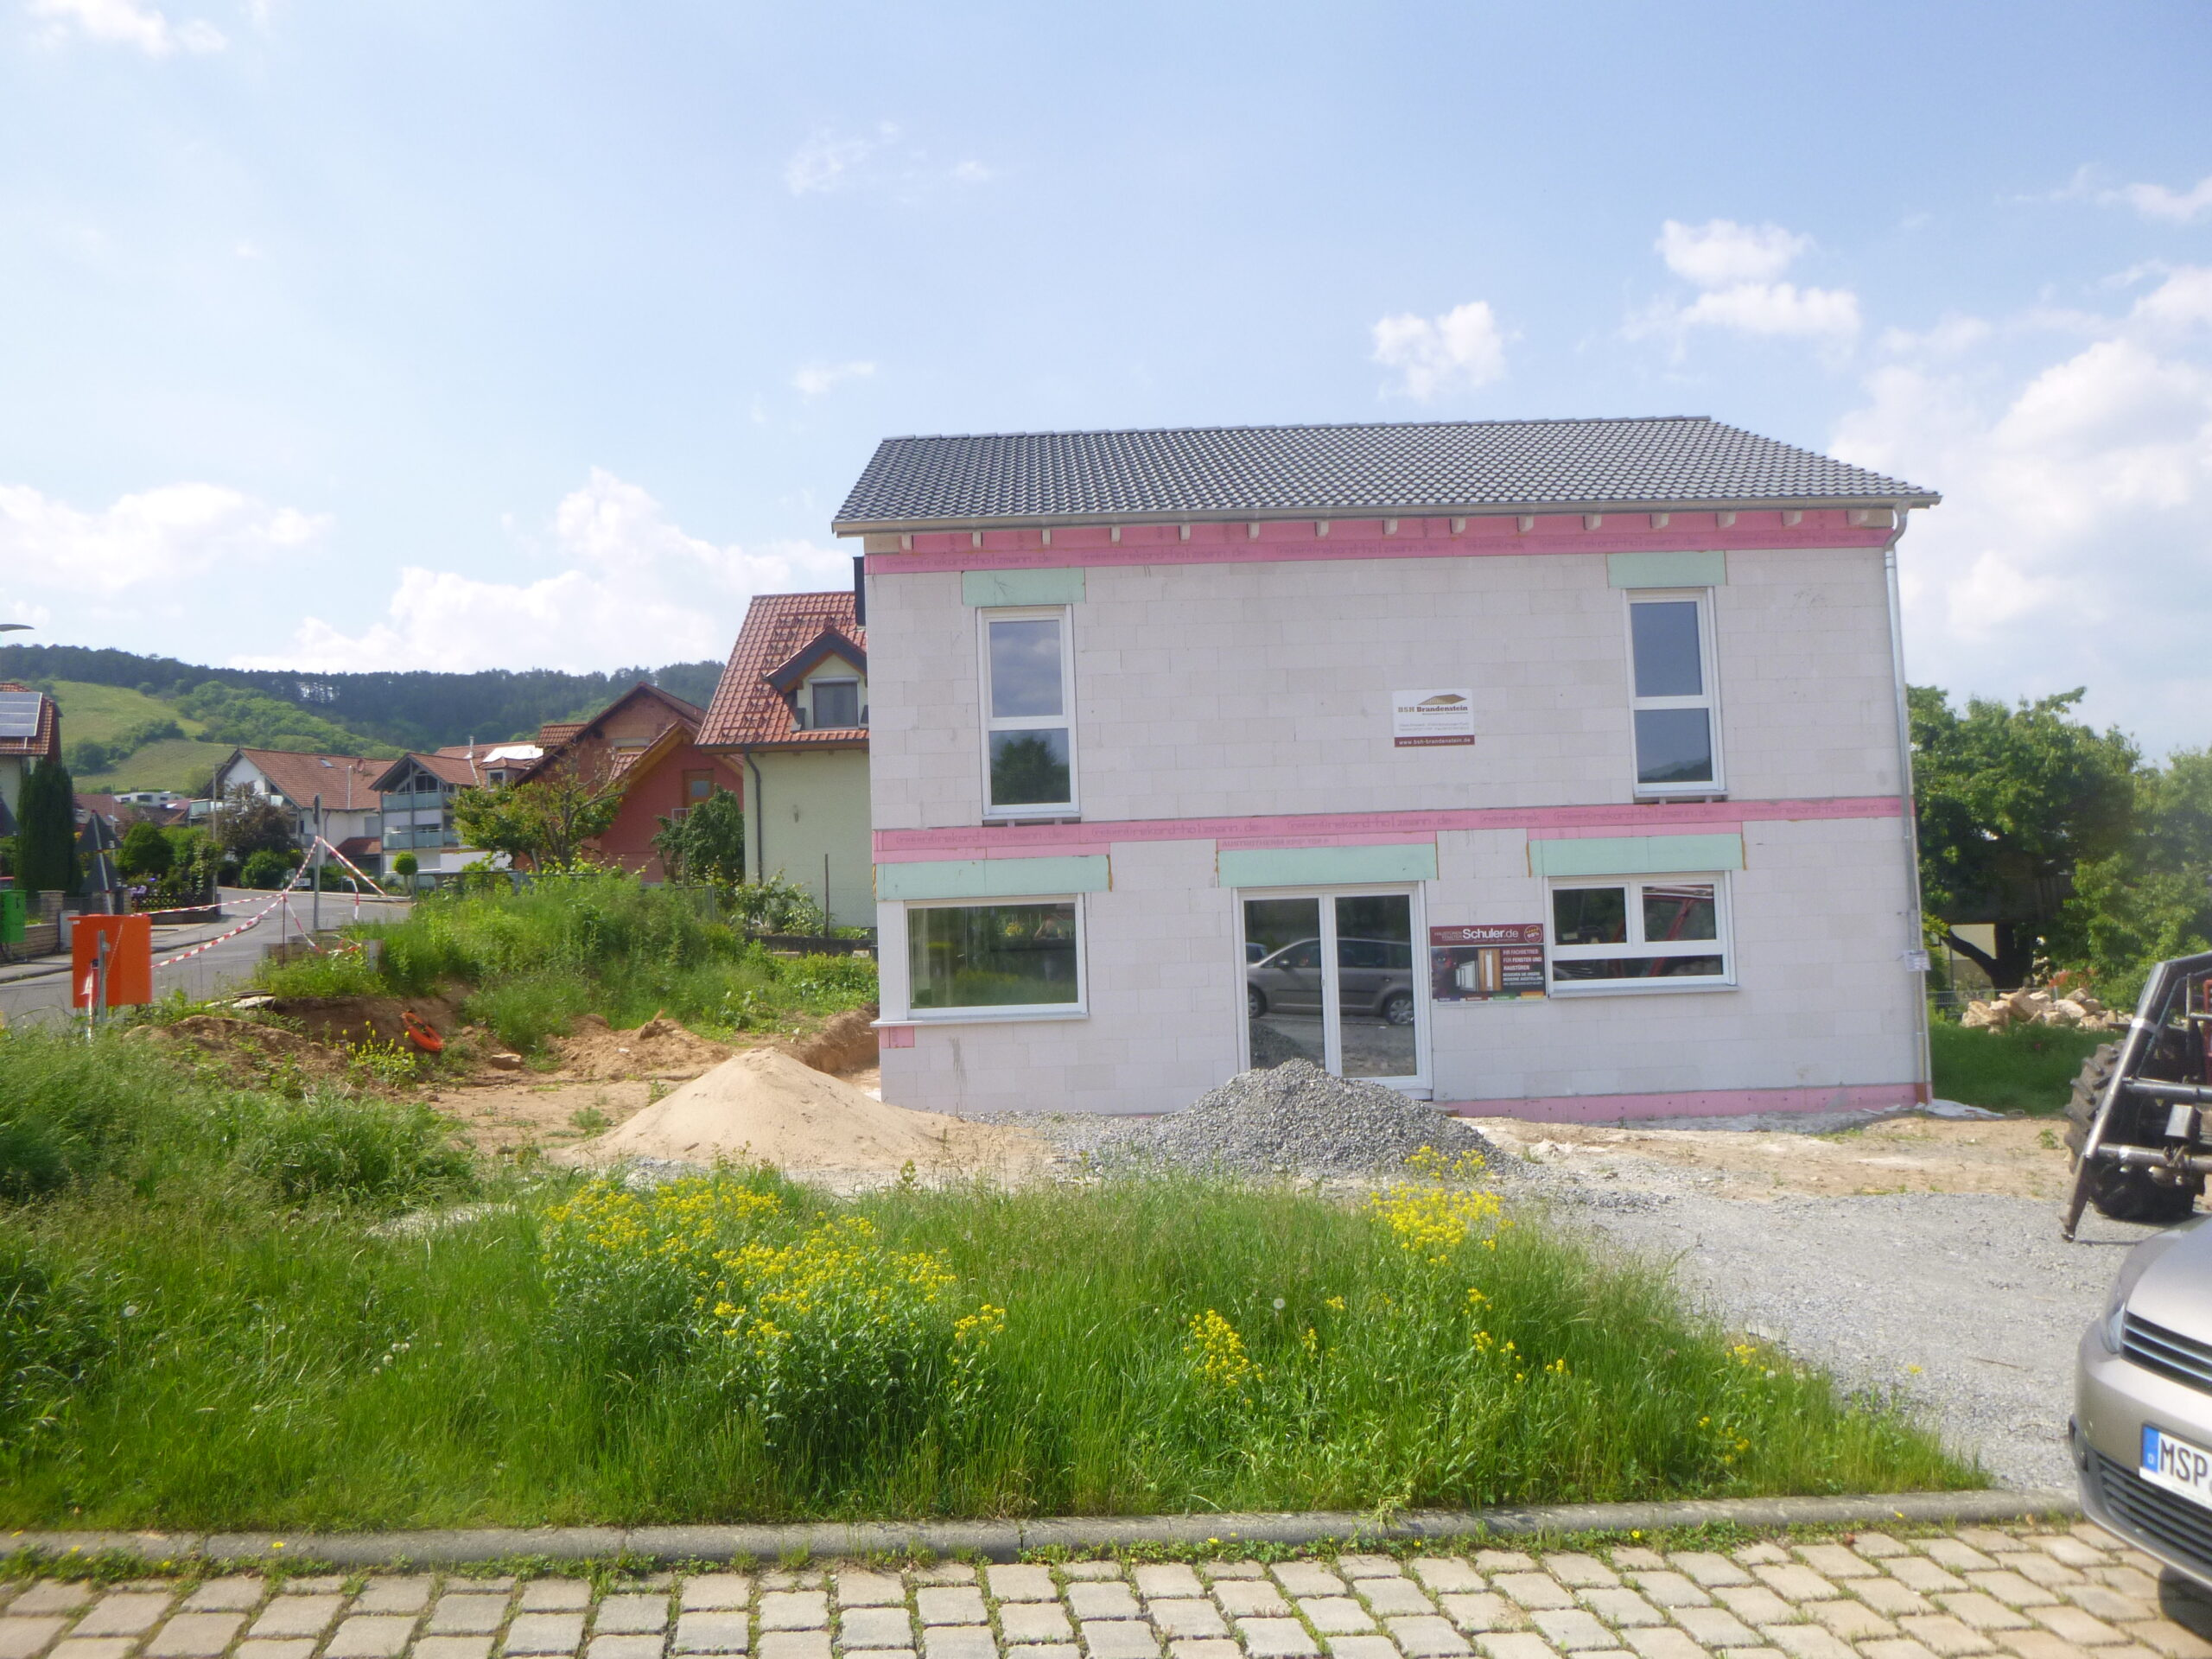 Rohbau - Graf-Rieneck-Strasse 20 - Erlabrunn (4)